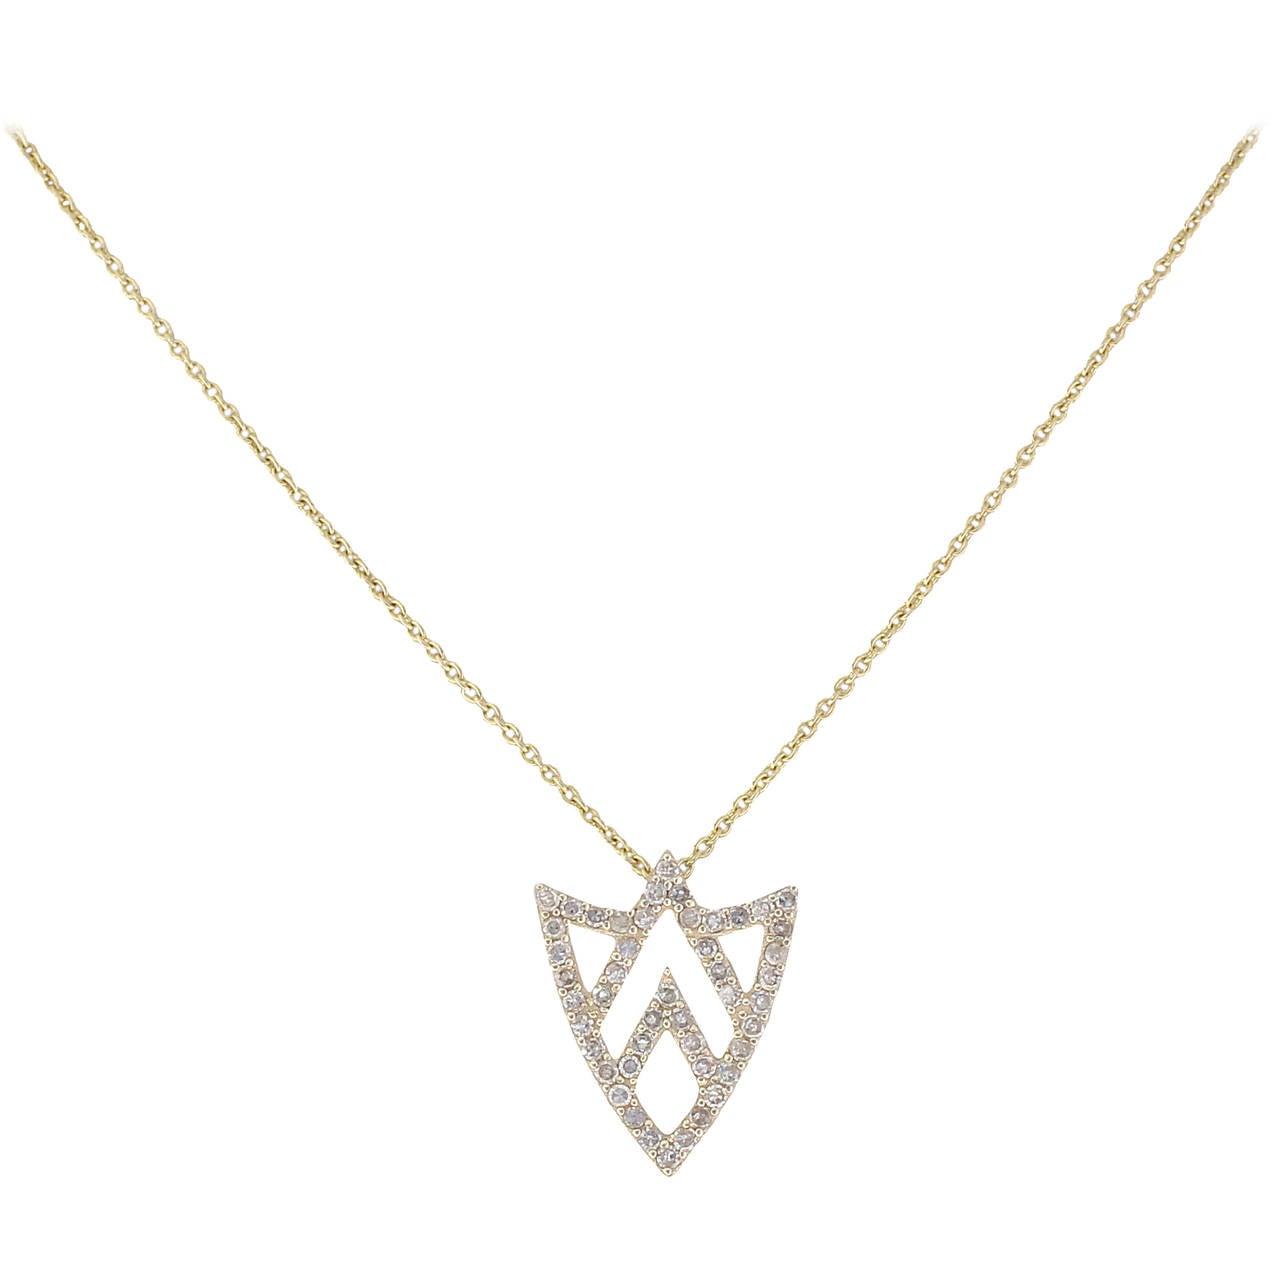 Chevron Shield 14k Yellow Gold and White Diamonds Necklace